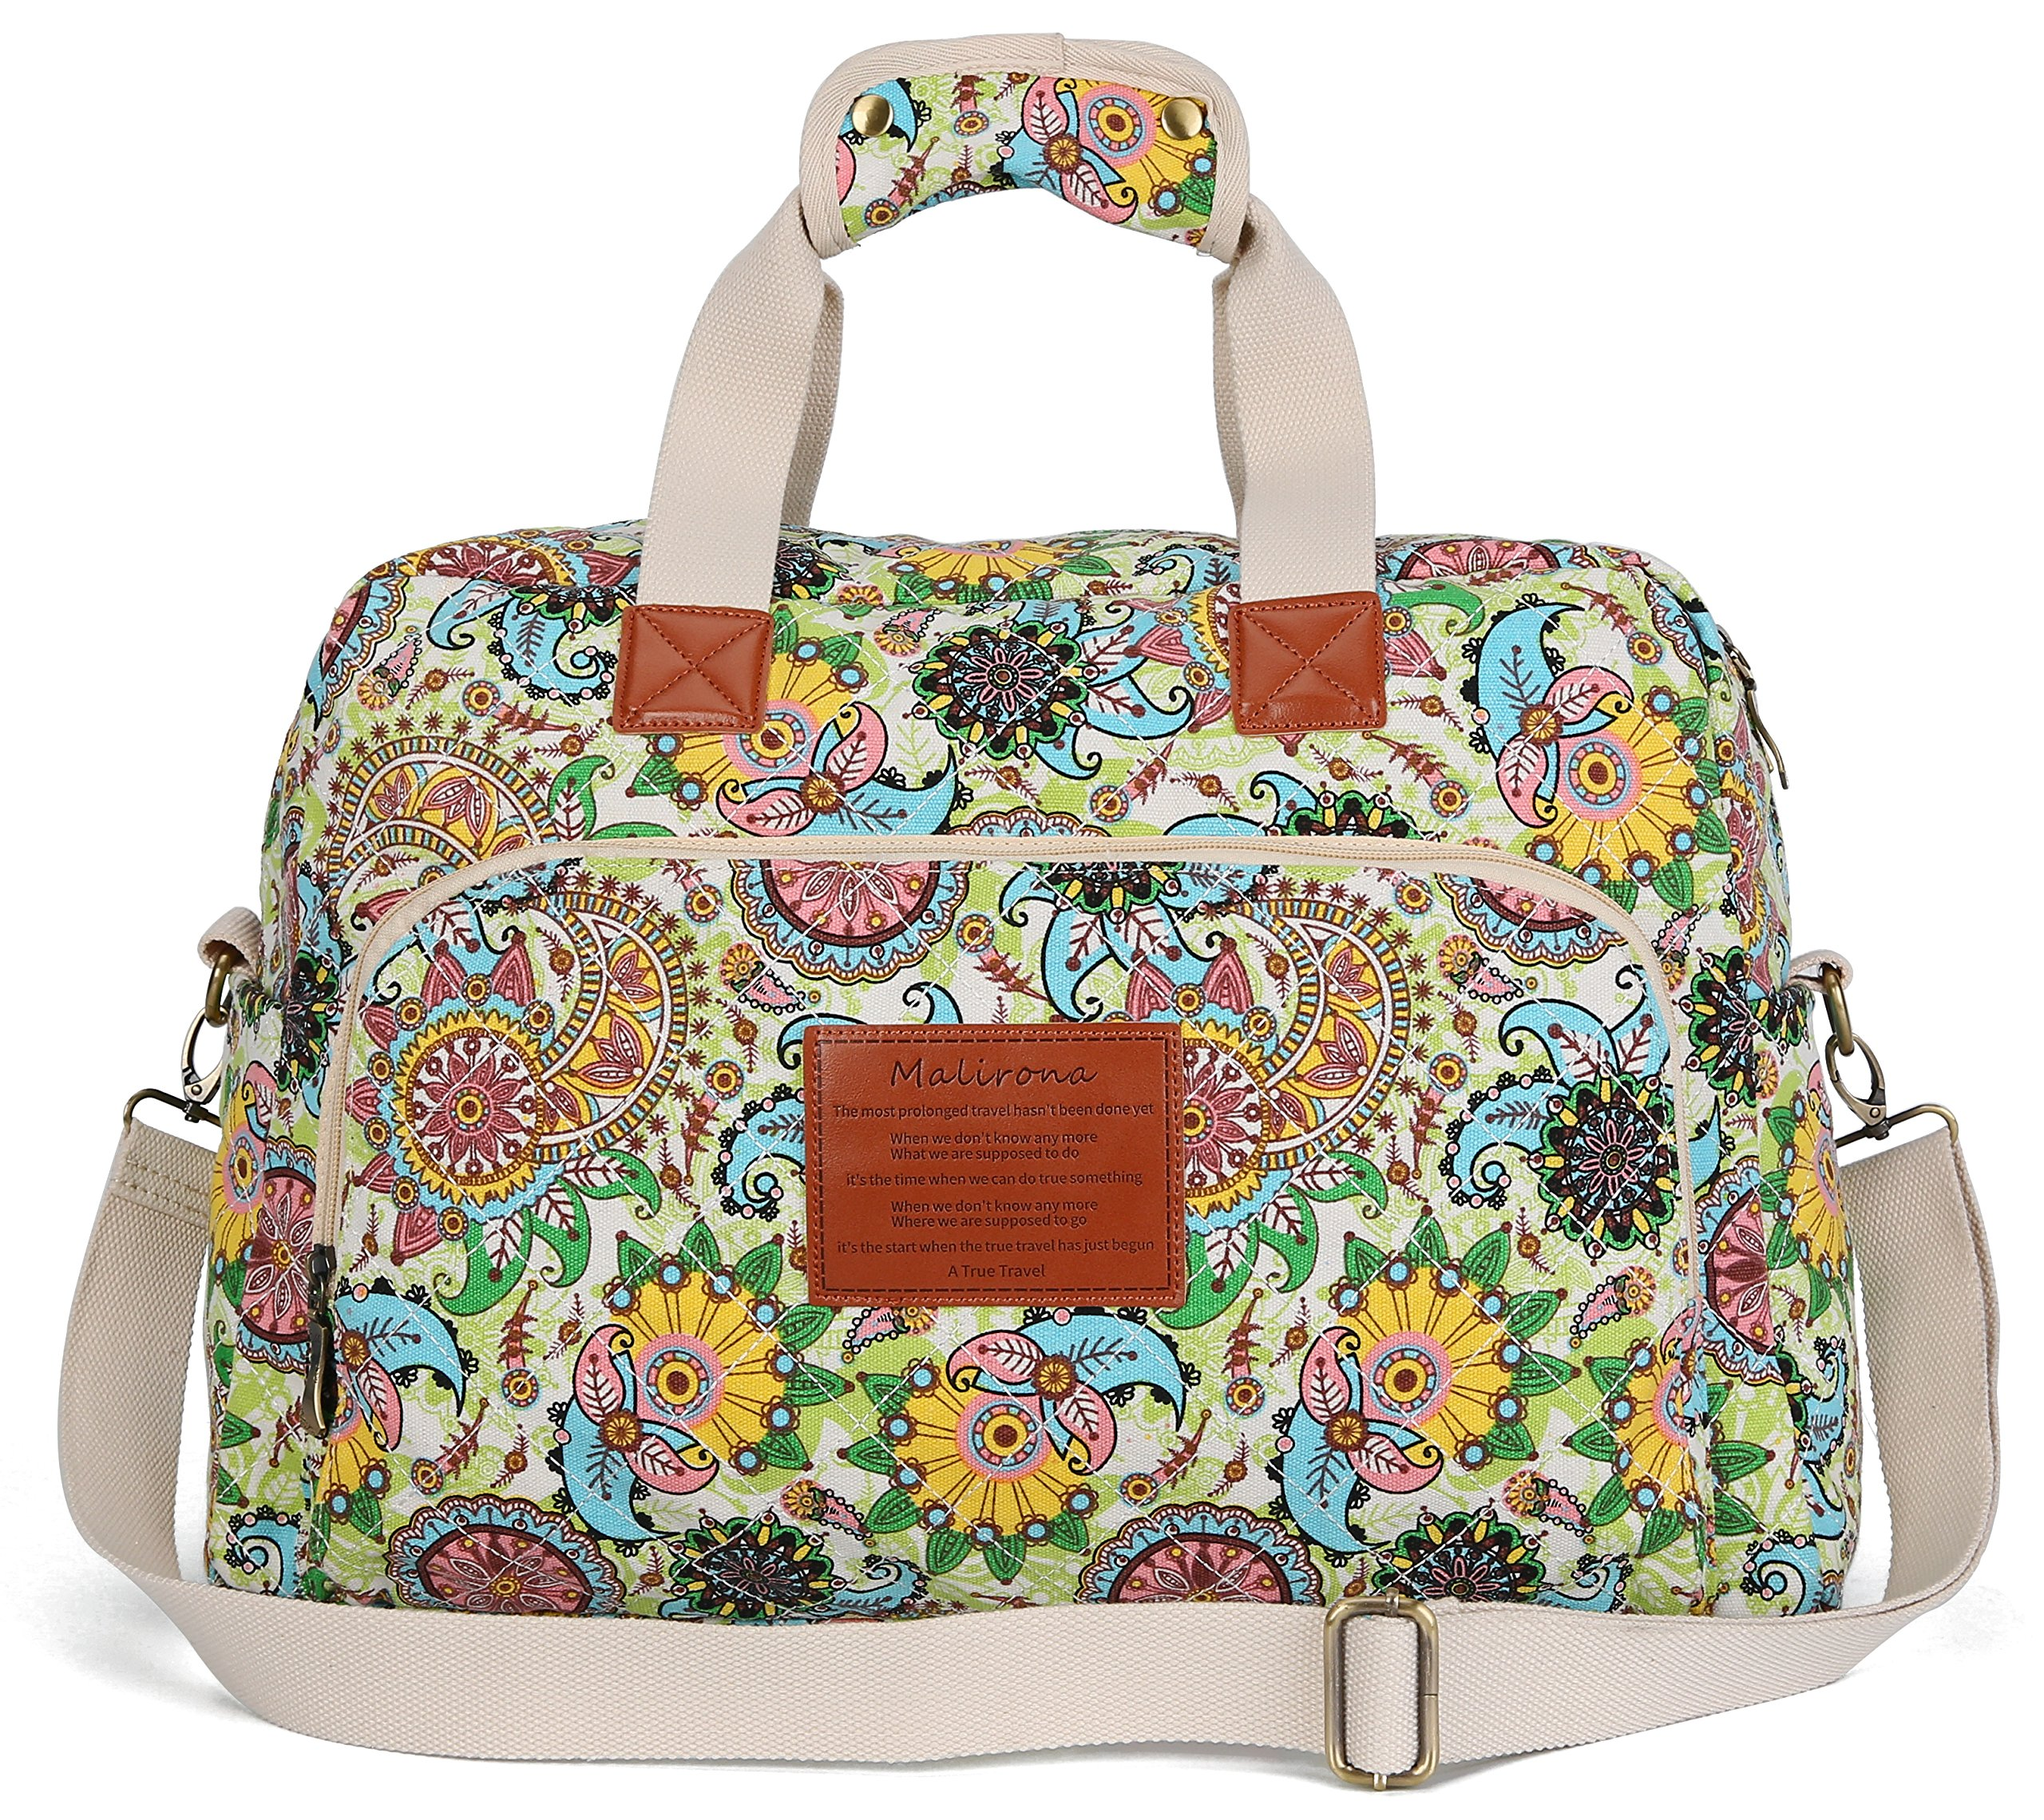 Malirona Canvas Overnight Bag Women Weekender Bag Carry On Travel Duffel Bag Floral Design (Flower)